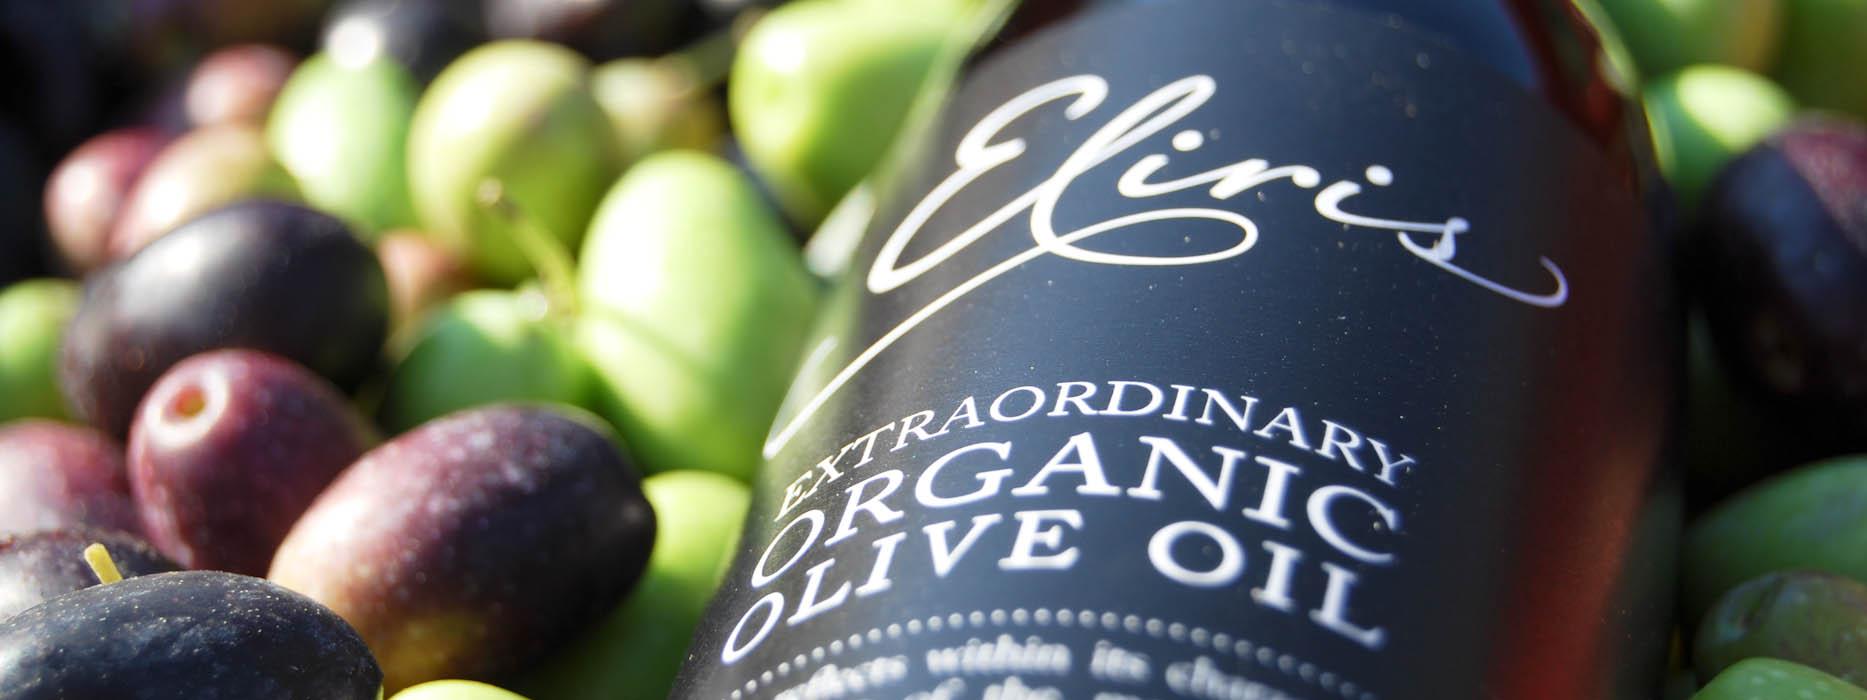 Eliris Organic Olive Oil